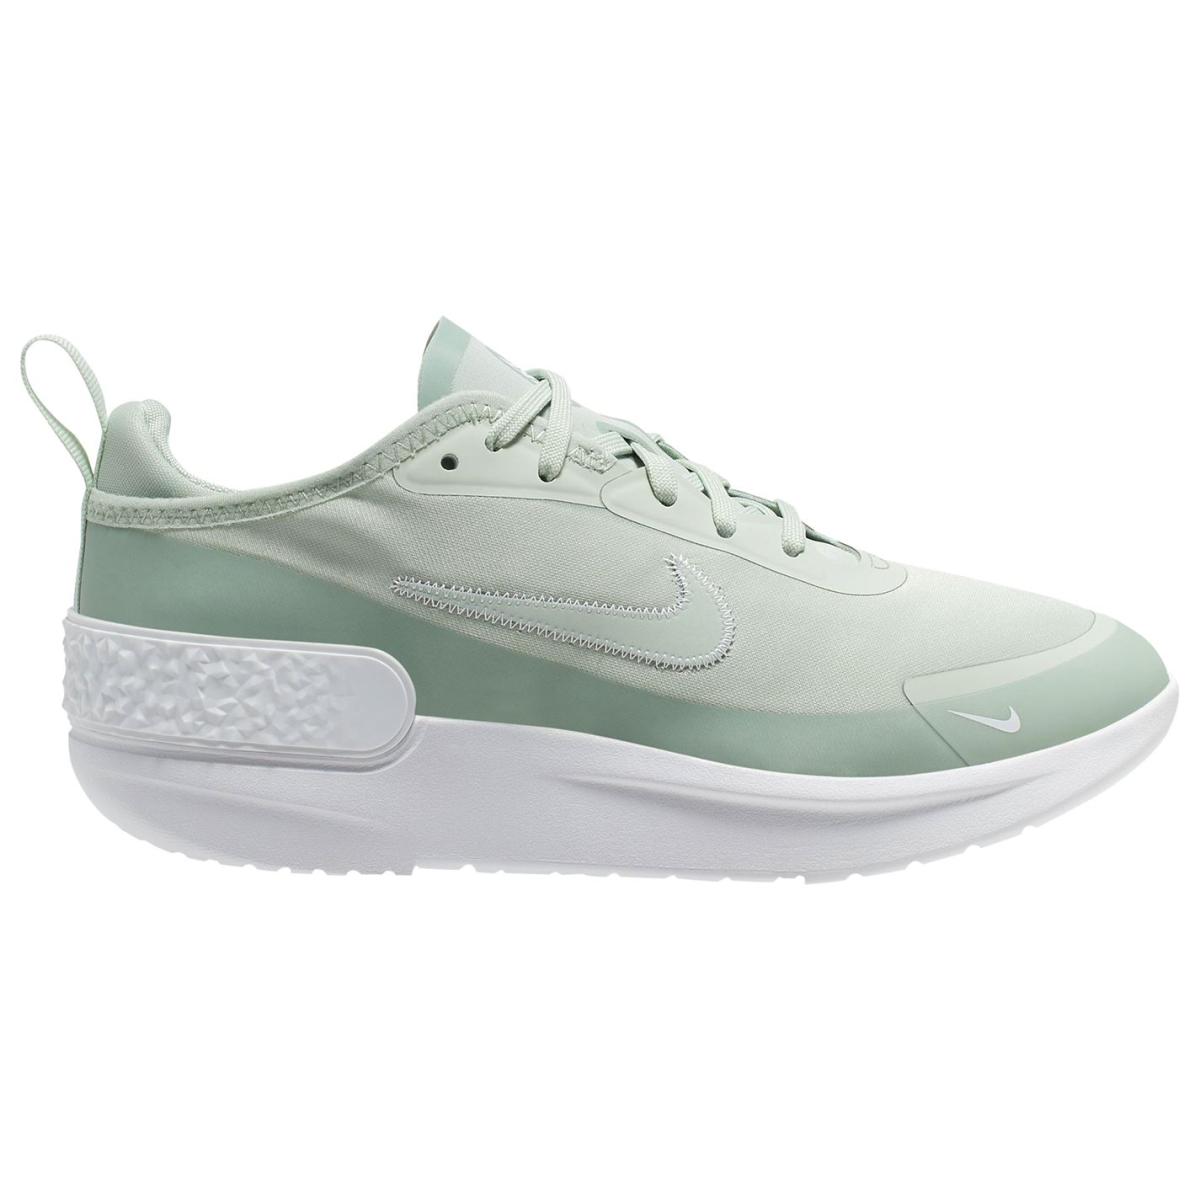 Nike Amixa Turnschuhe Damen Sneaker Sportschuhe Laufschuhe 4035